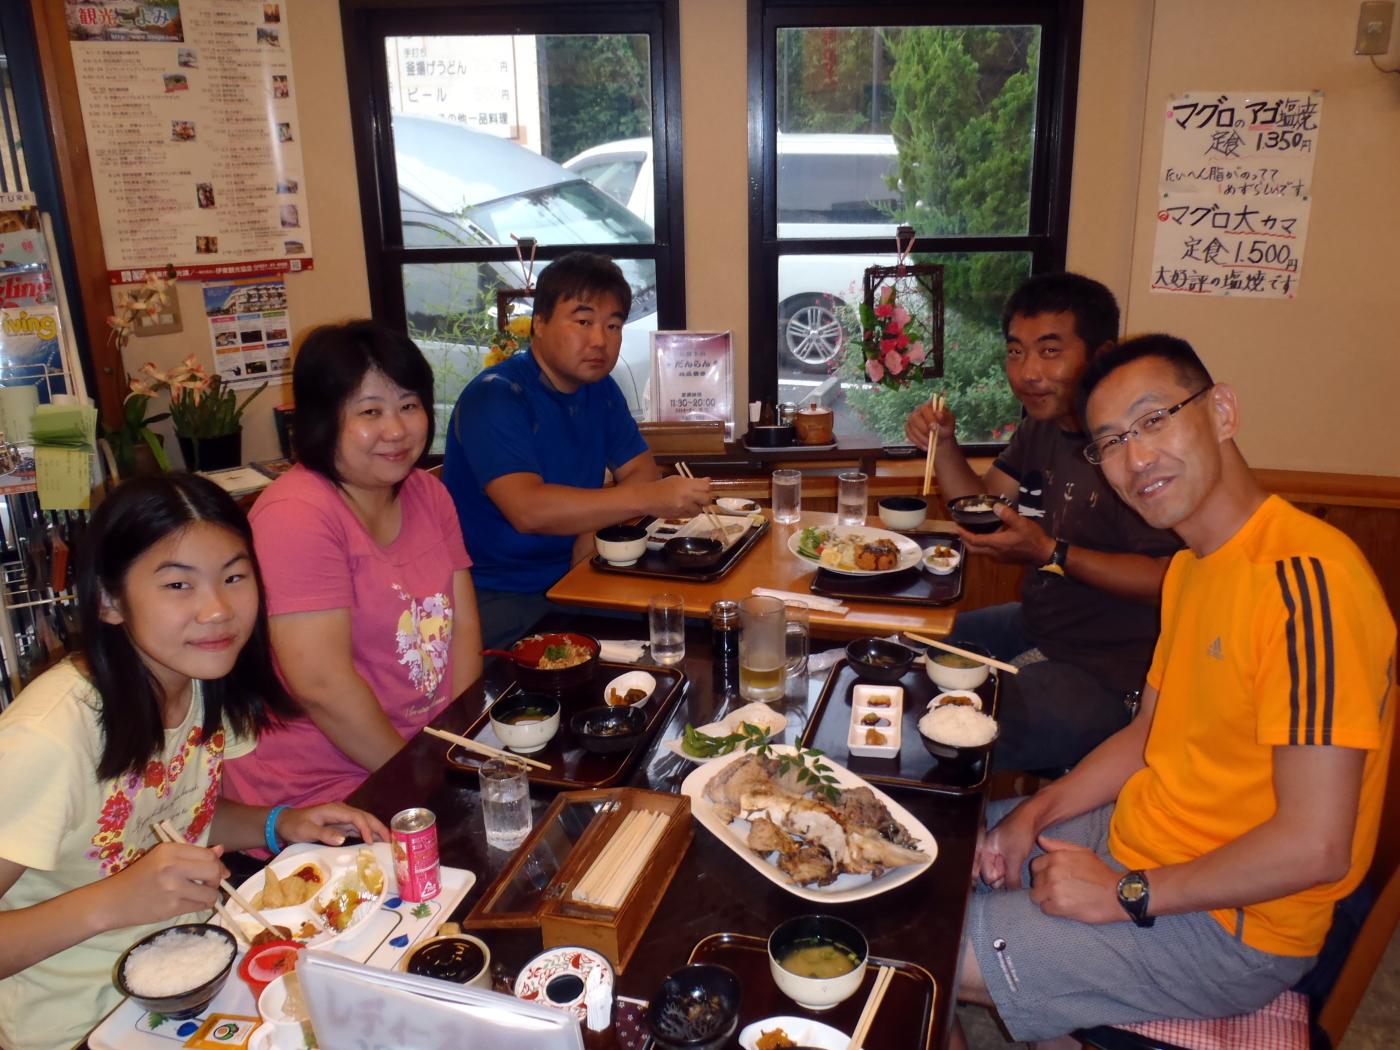 201187_iop0054